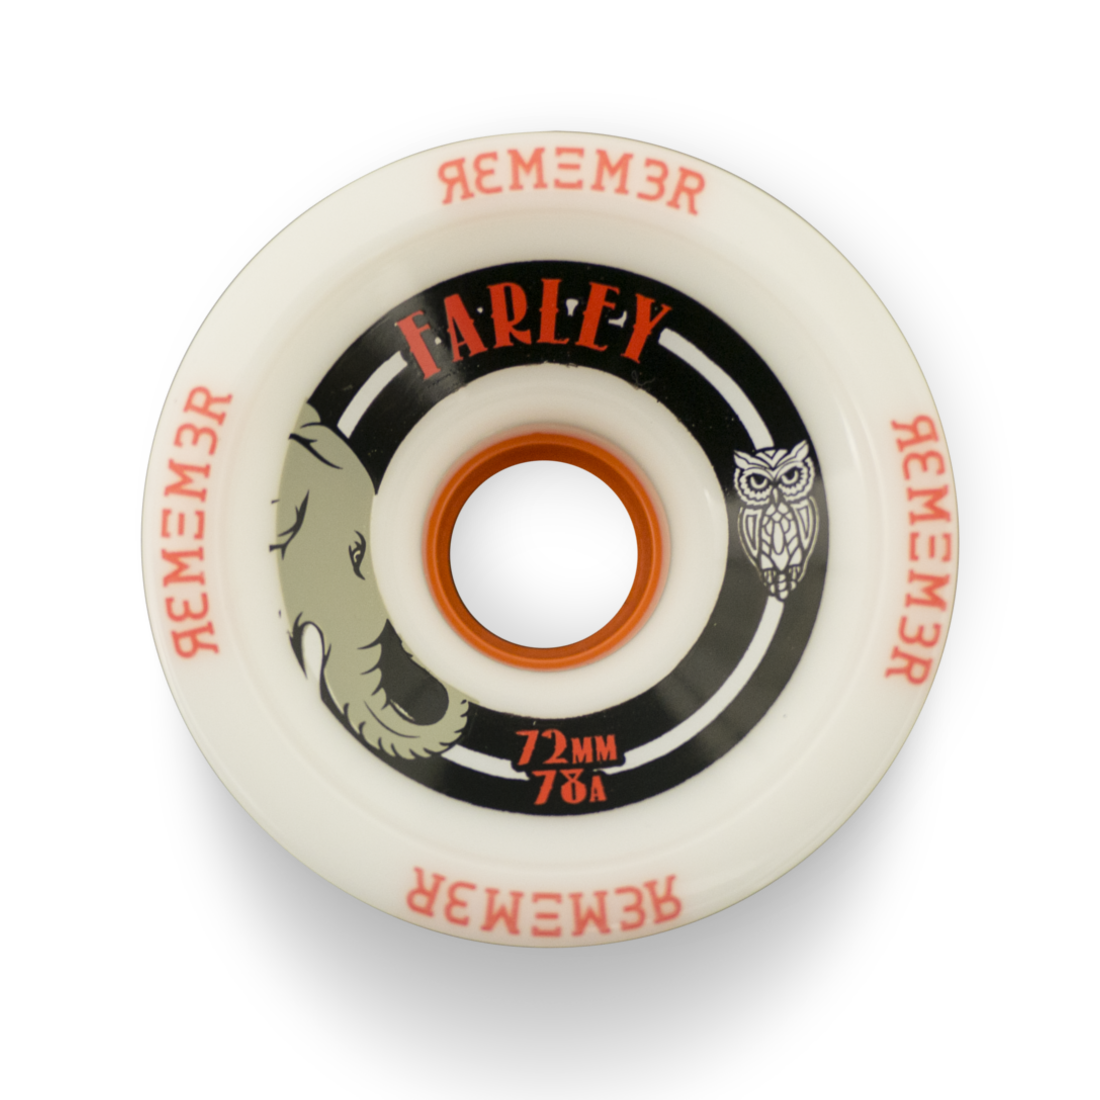 Remember Farley Farley Farley Wheels Longboard Rollen 72mm 74a 78a 8e09d1